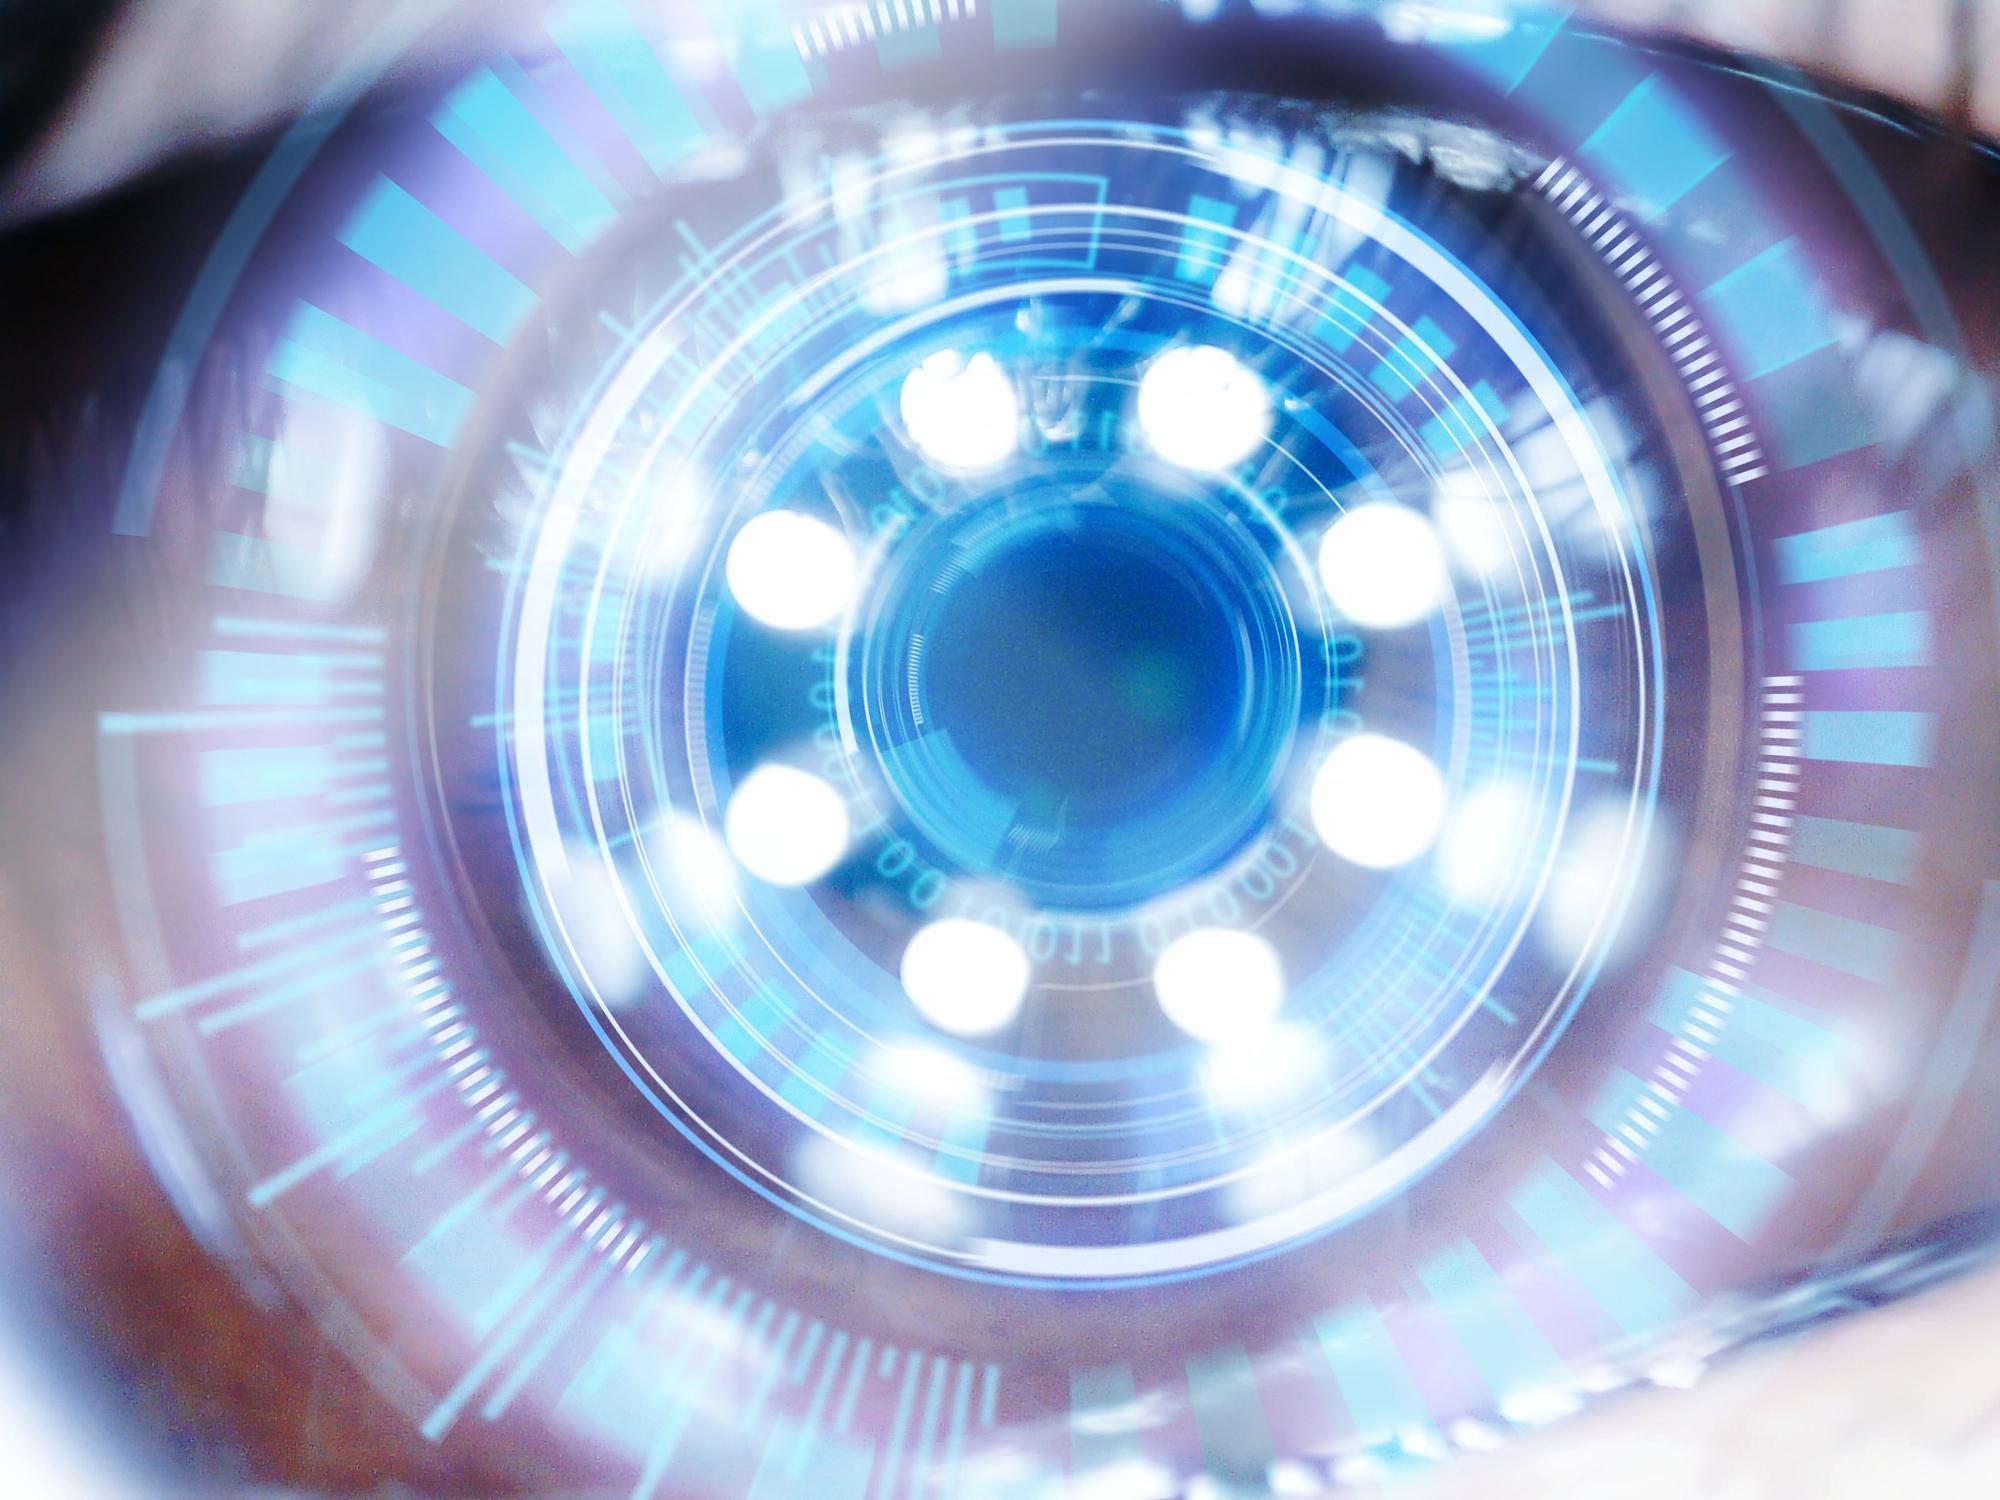 digital camera as an eye